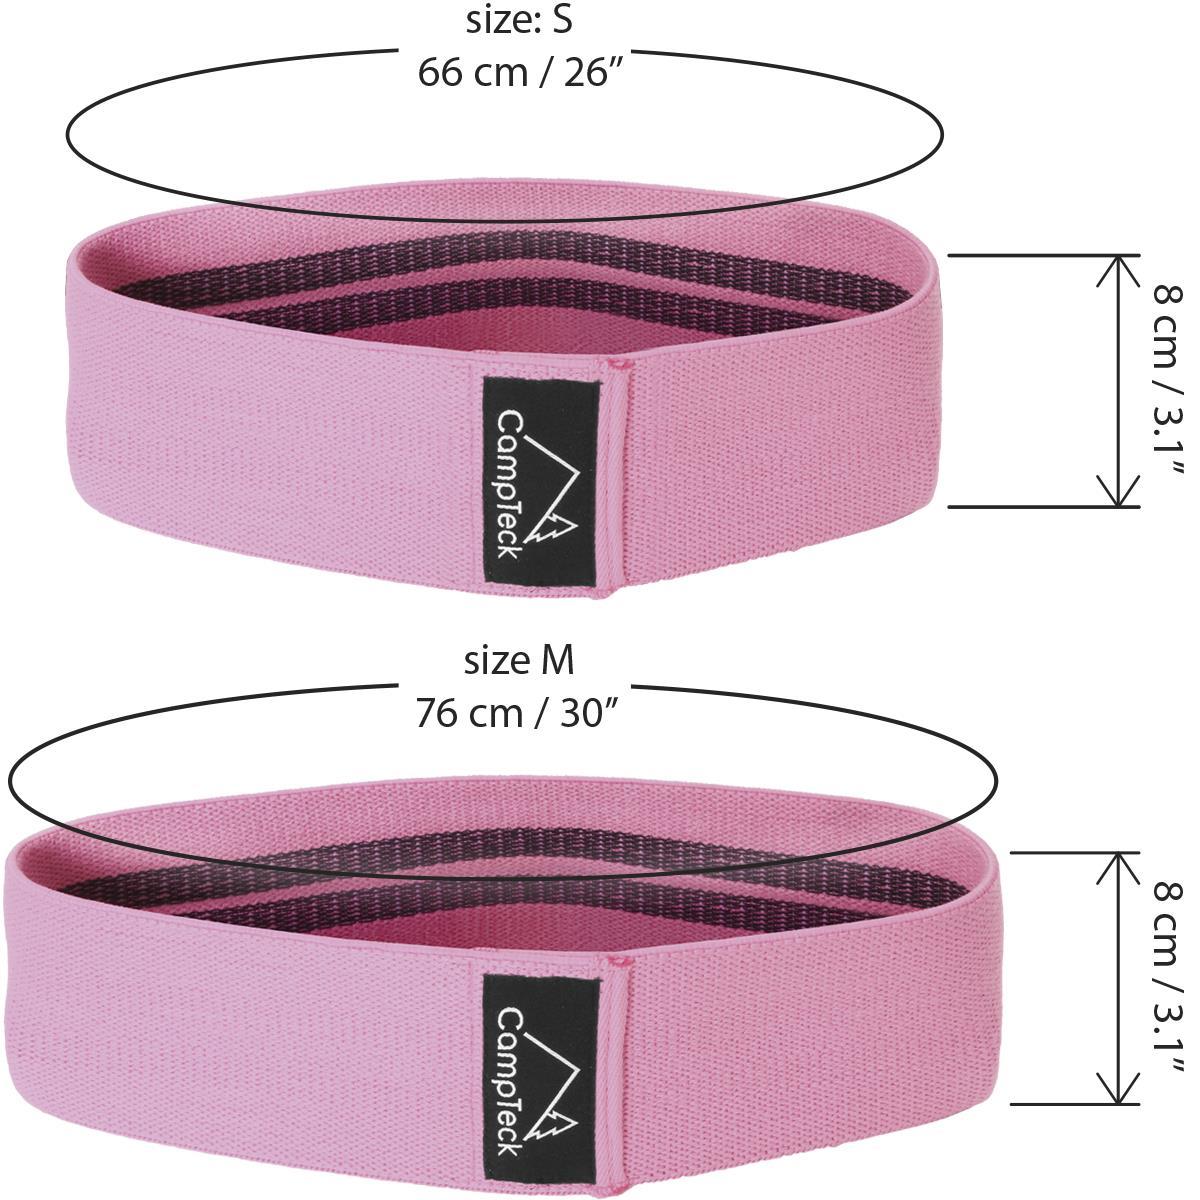 Hip-Band-Circle-Loop-Rotation-Glute-Resistance-Thrust-Leg-Squat-Gym-Exercise miniatuur 15